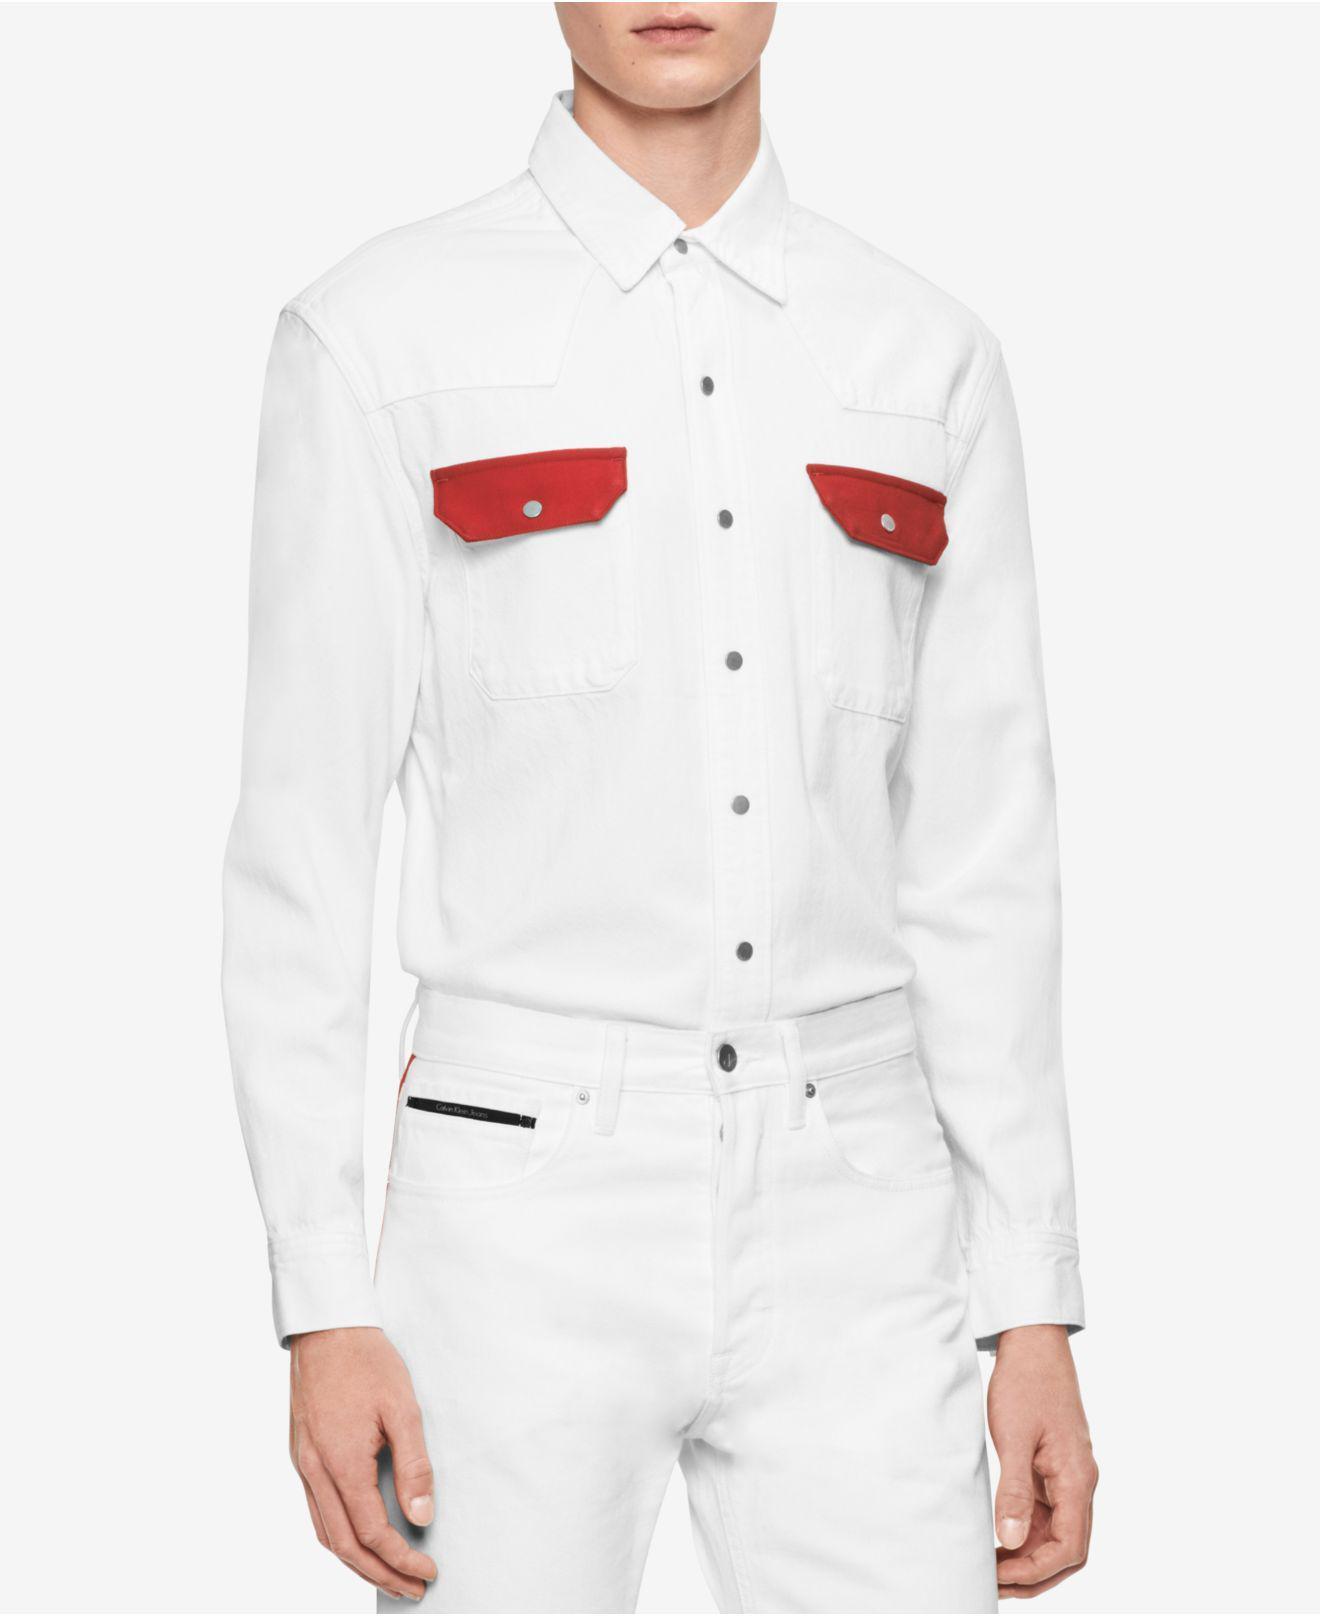 f9619c7f2b Lyst - Calvin Klein Archive Contrast Pocket Western Shirt in White ...